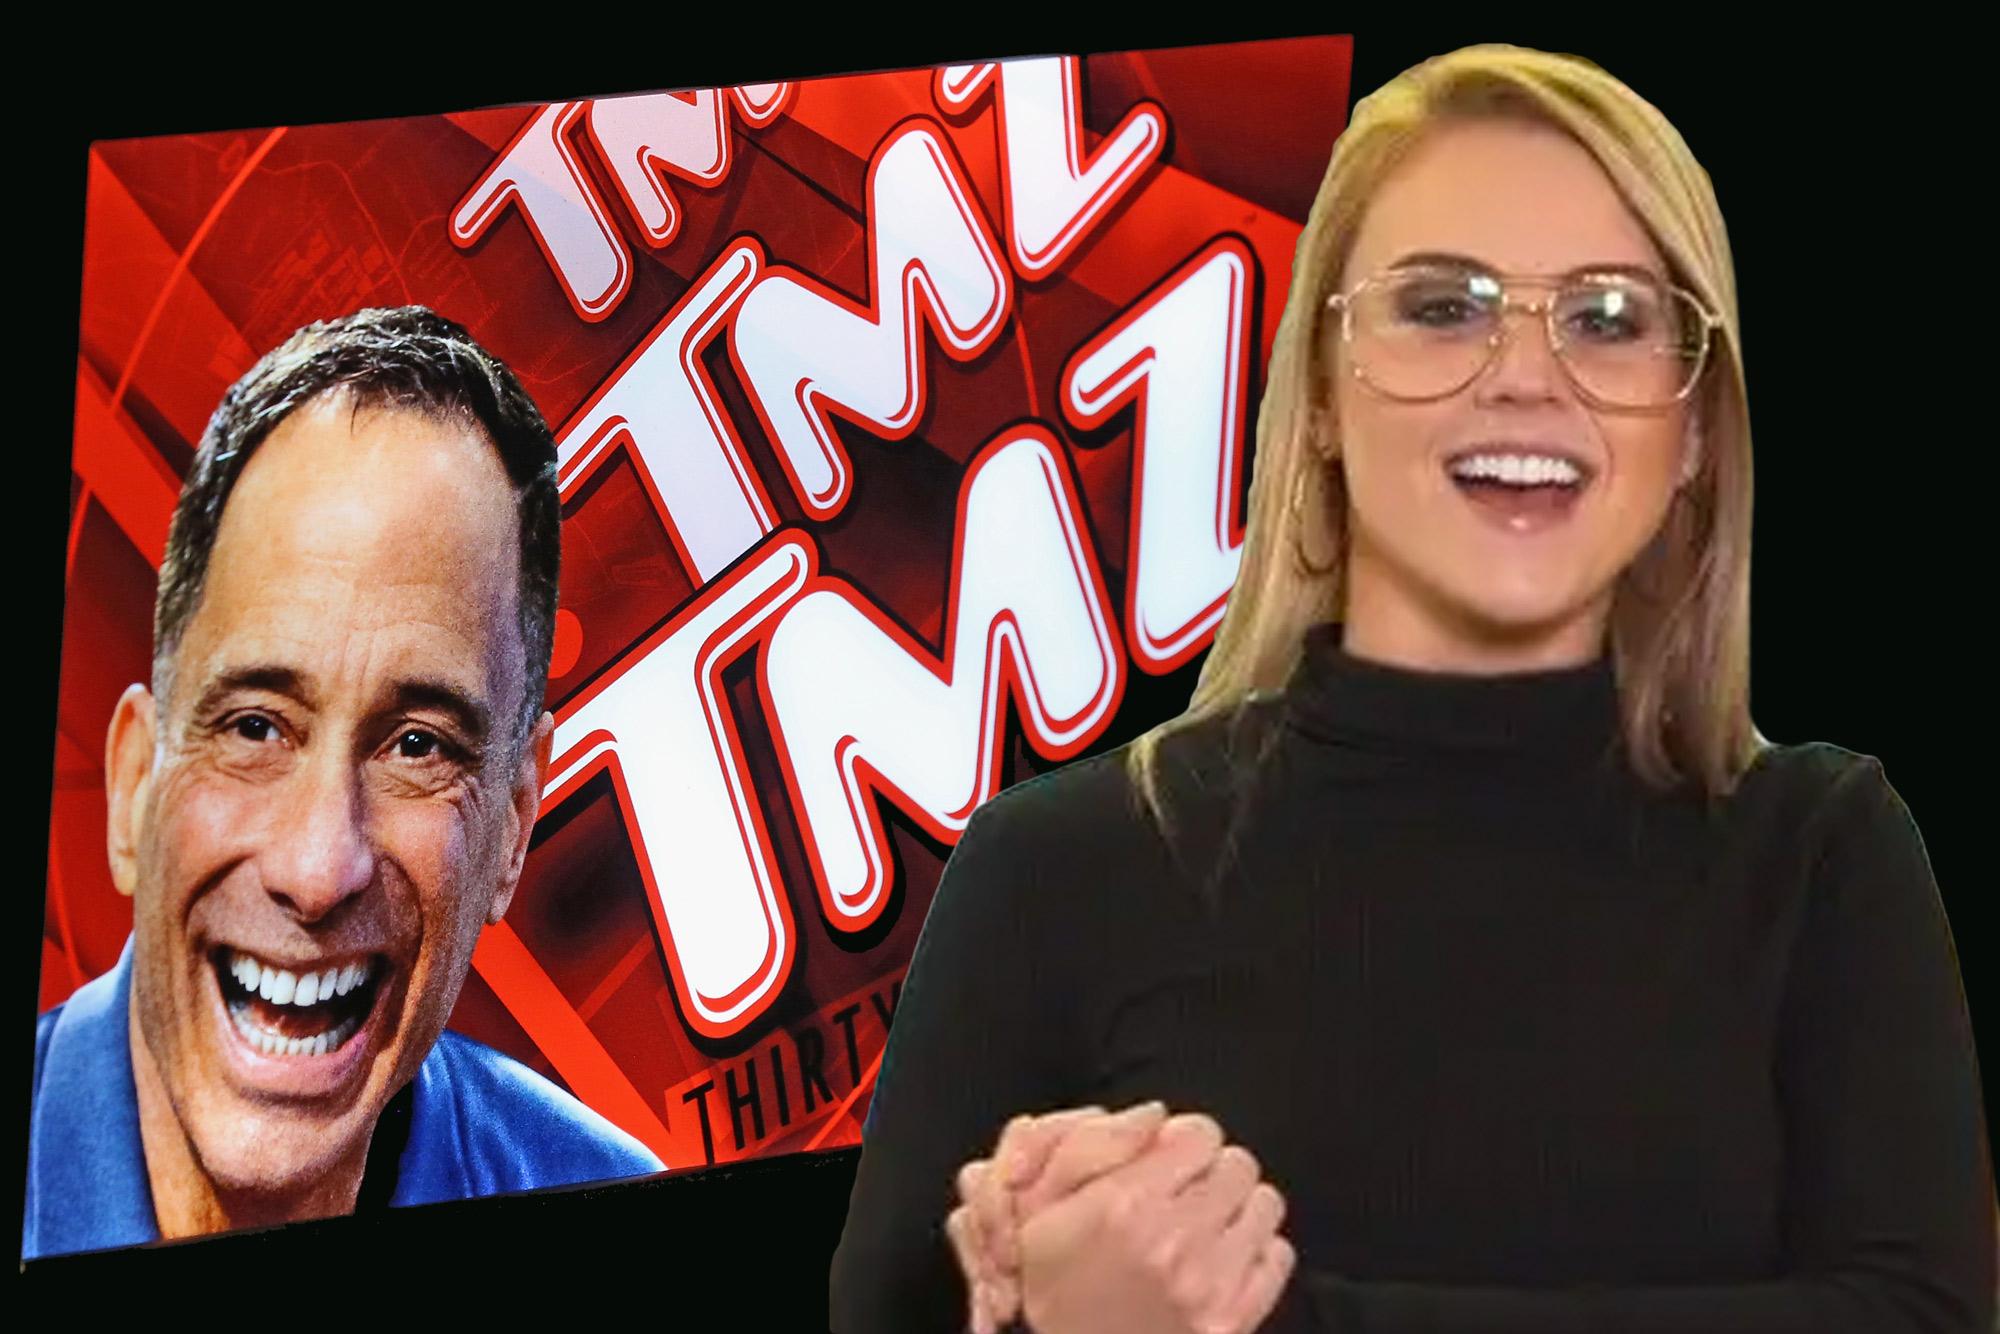 woman tmz cast 2020